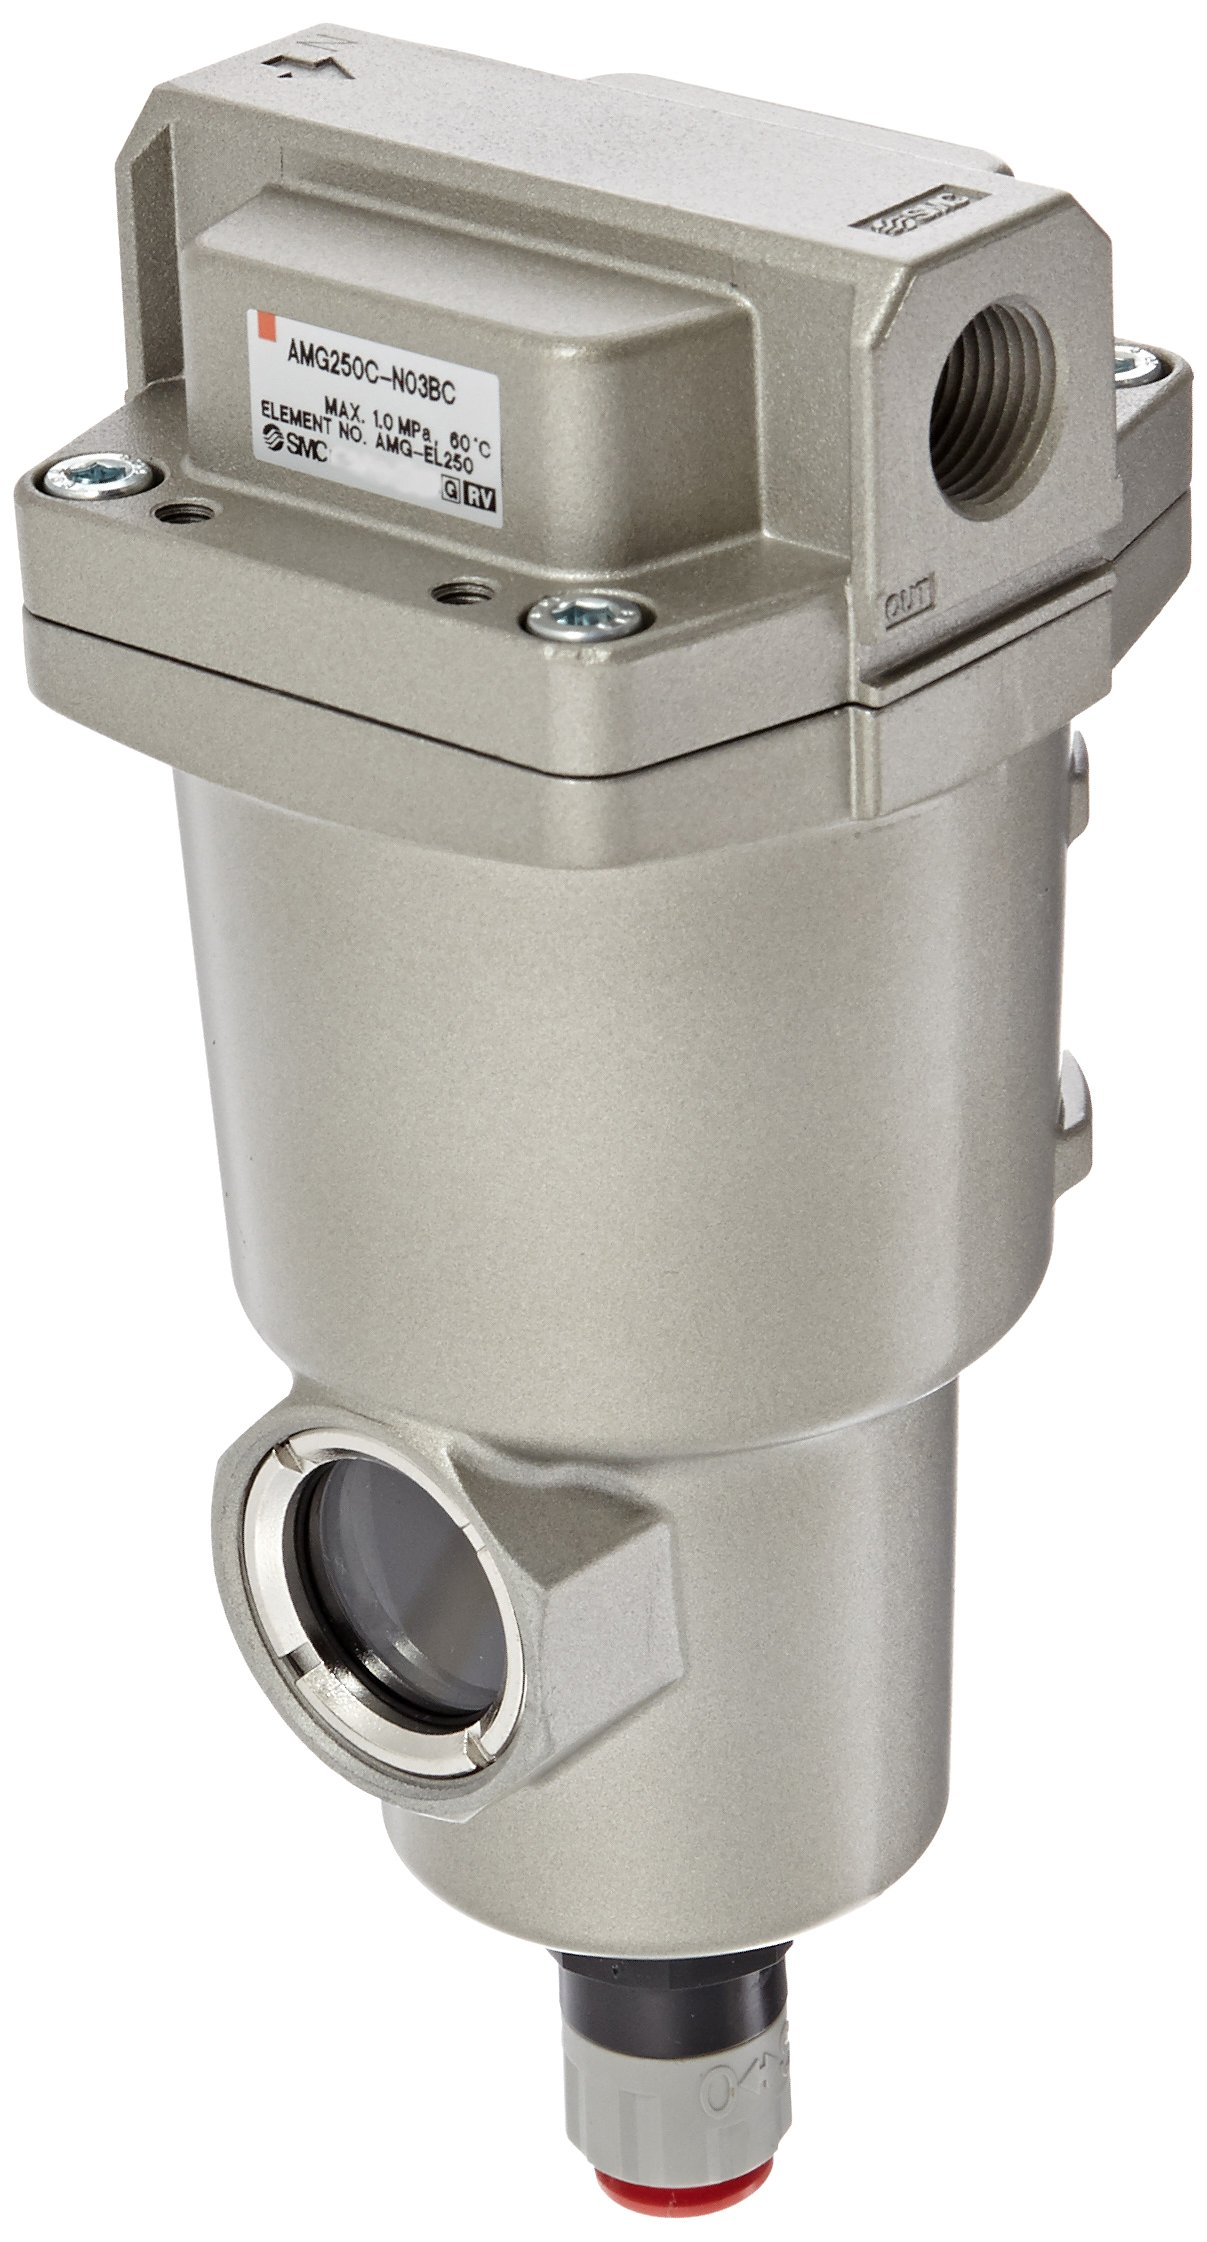 SMC AMG250C-N03BC Water Separator, N.C. Auto Drain, 750 L/min, 3/8'' NPT, Mounting Bracket